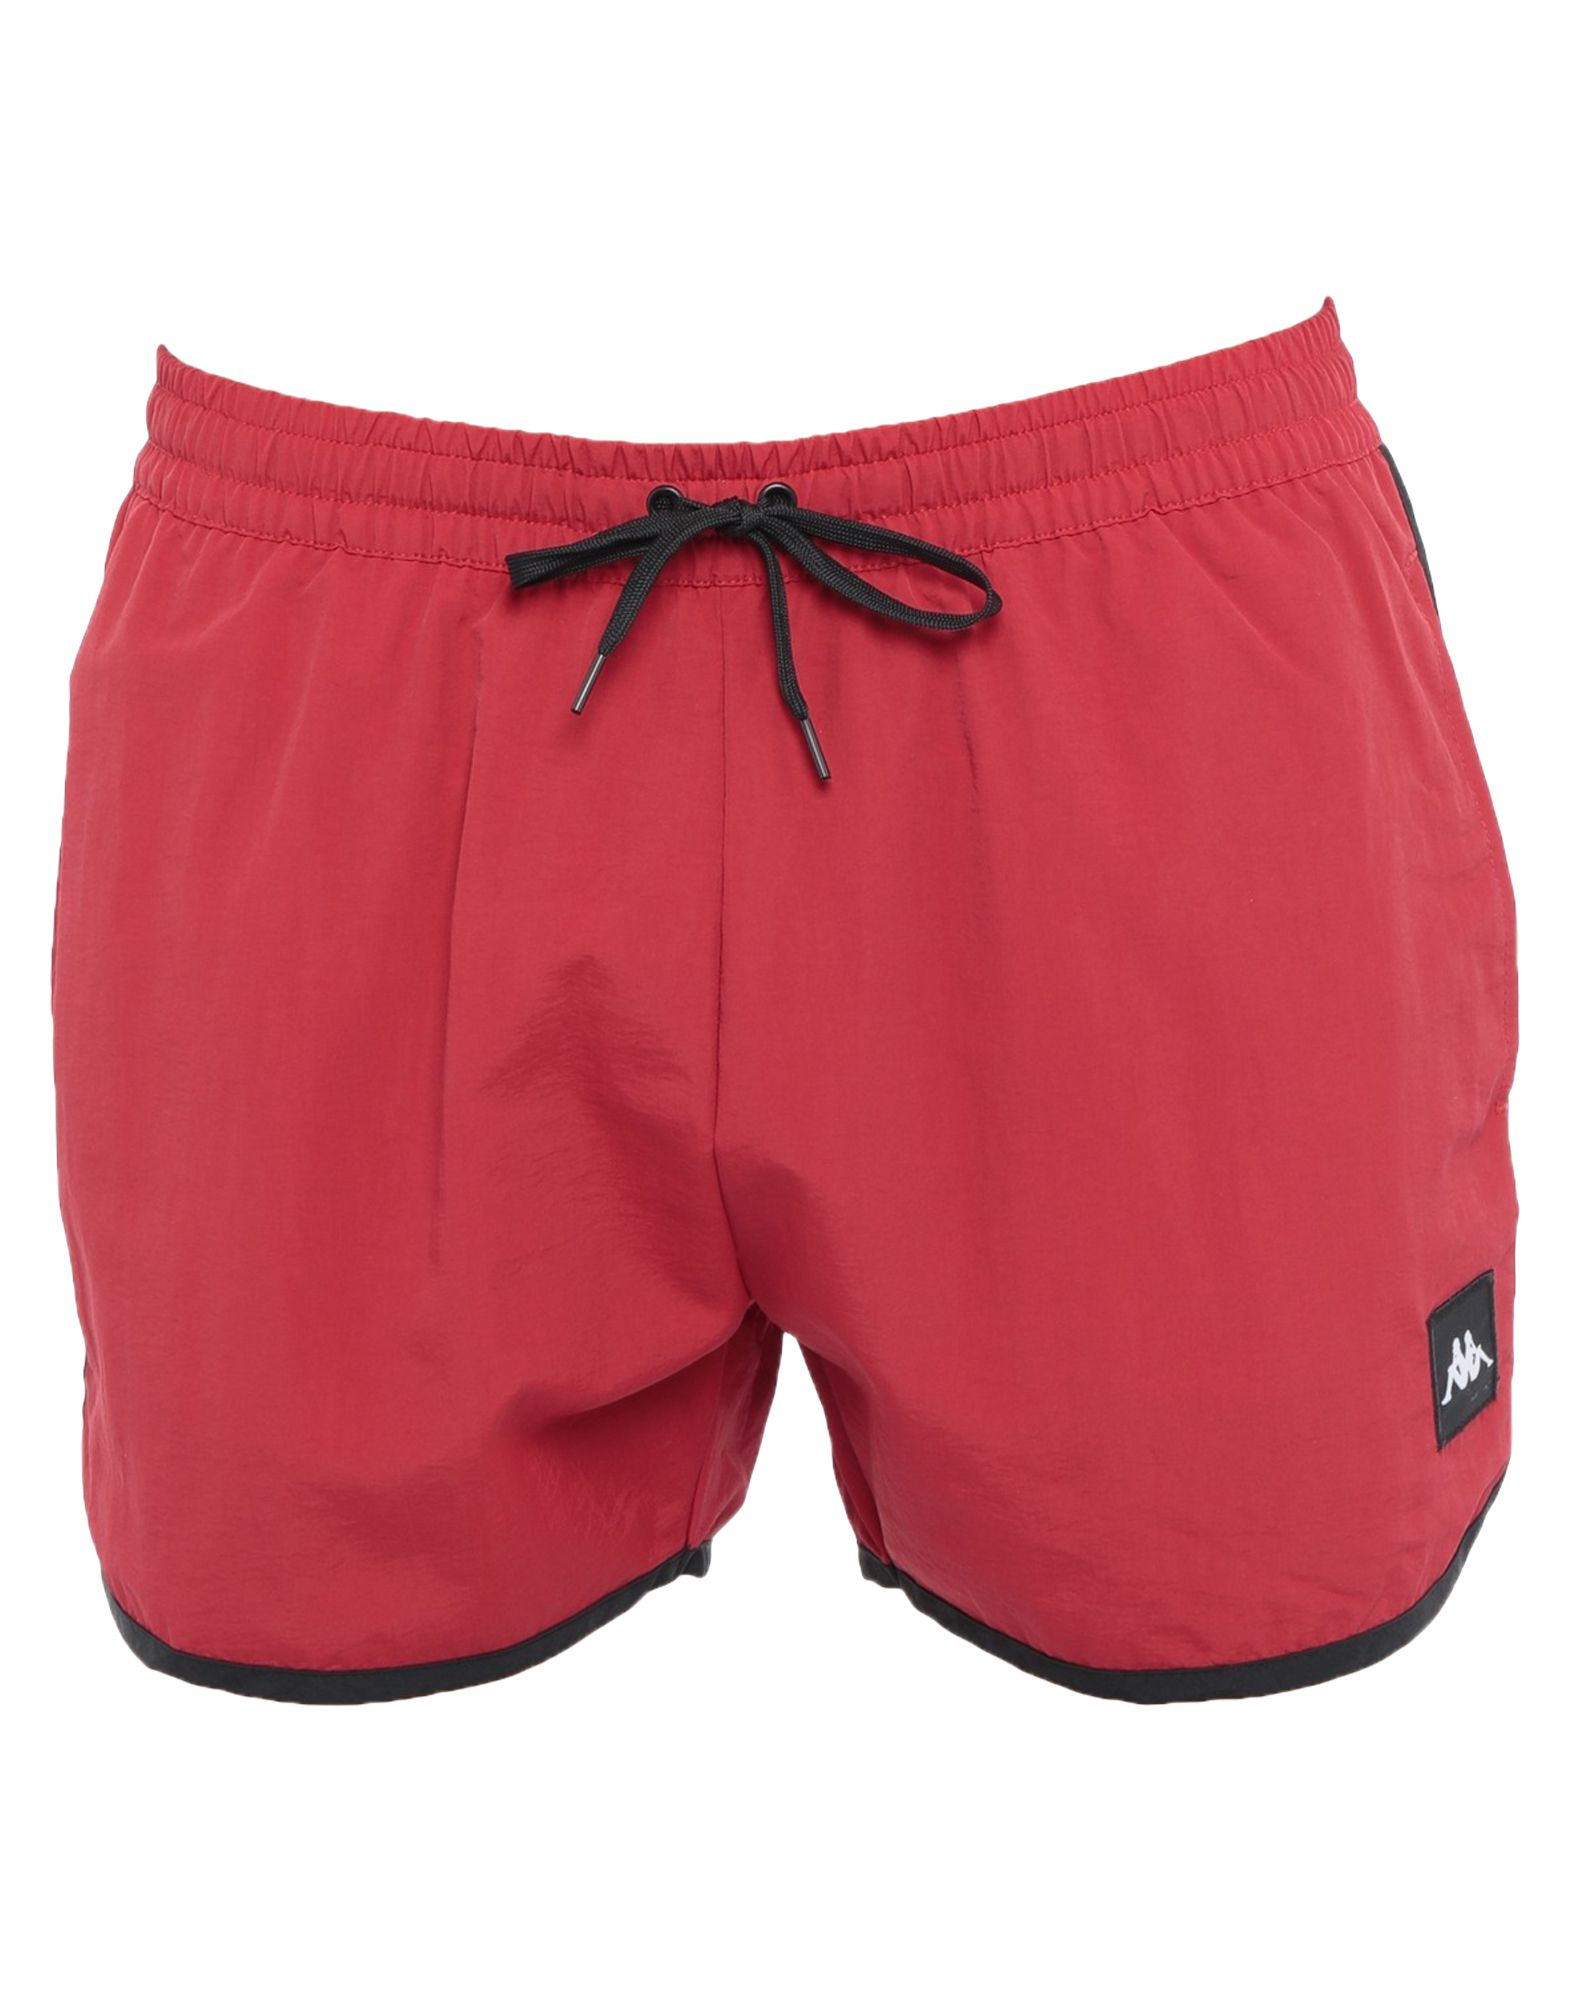 KAPPA Swim trunks - Item 47252515